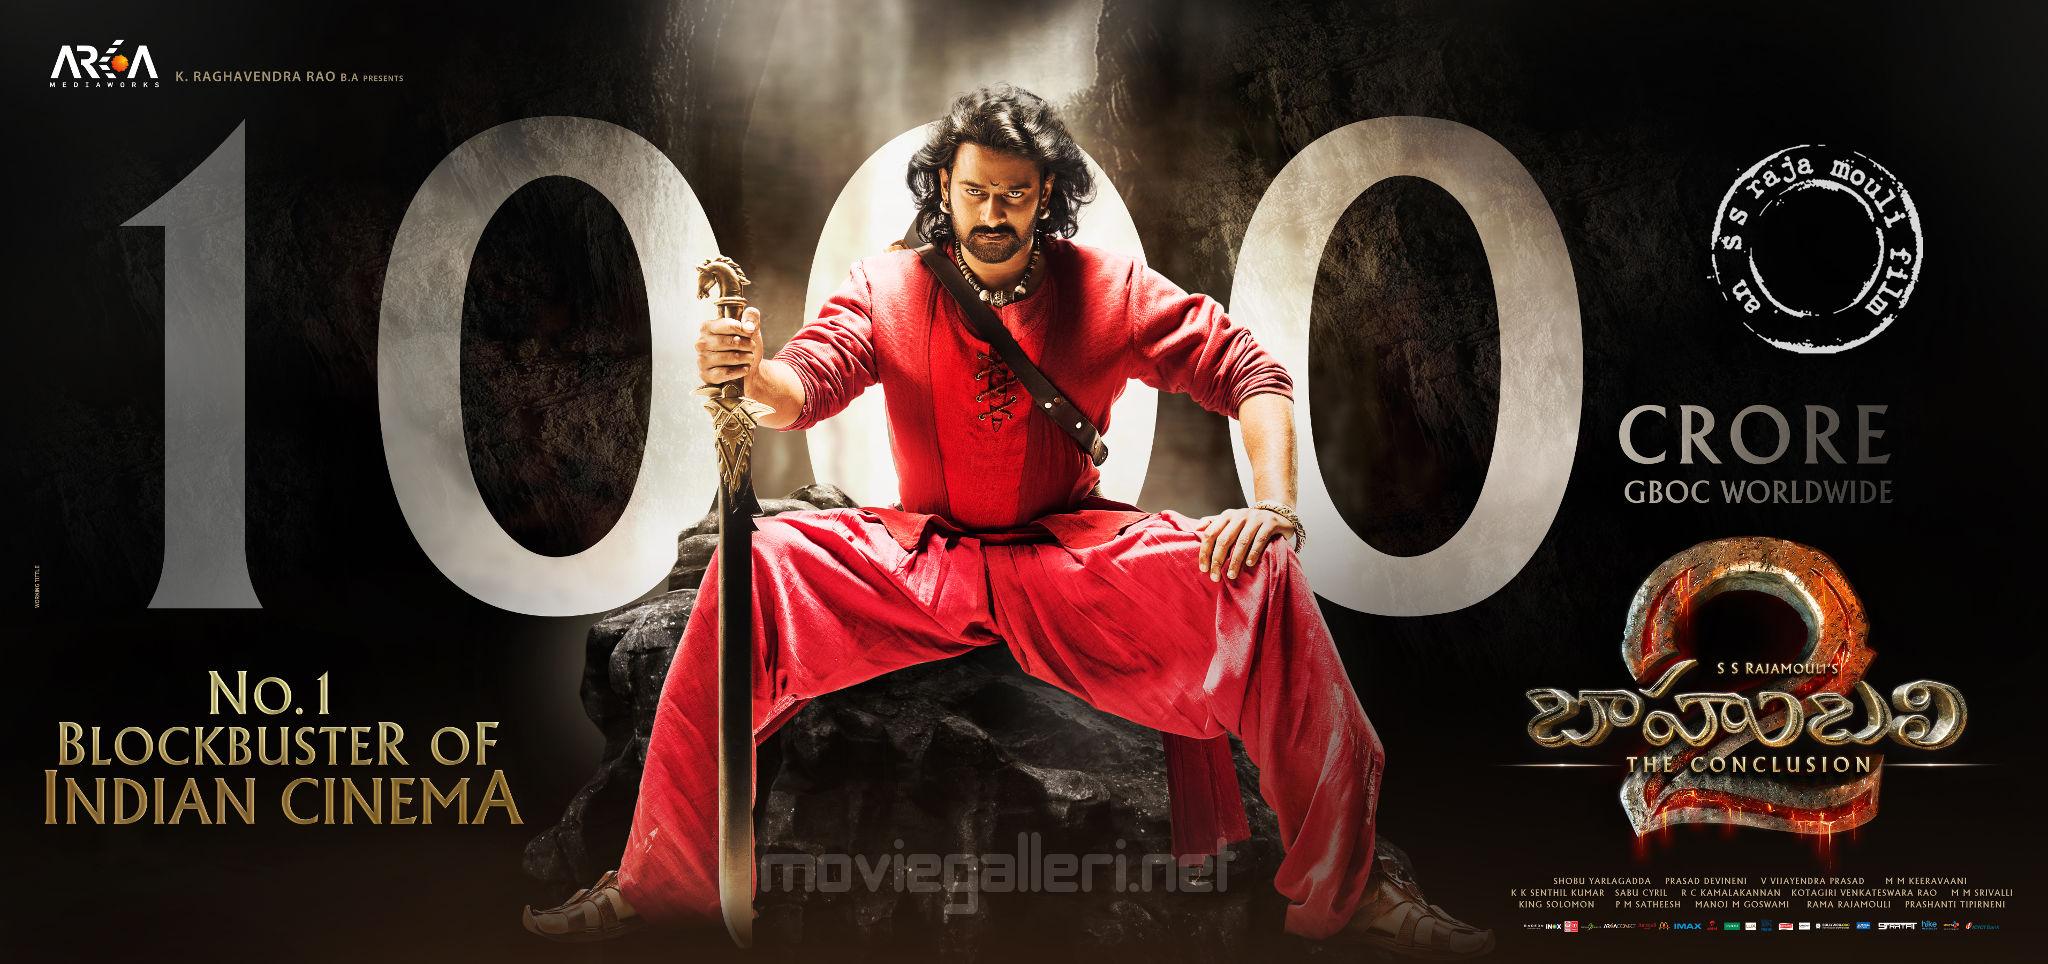 Baahubali 2 Movie 1000 Crore Poster